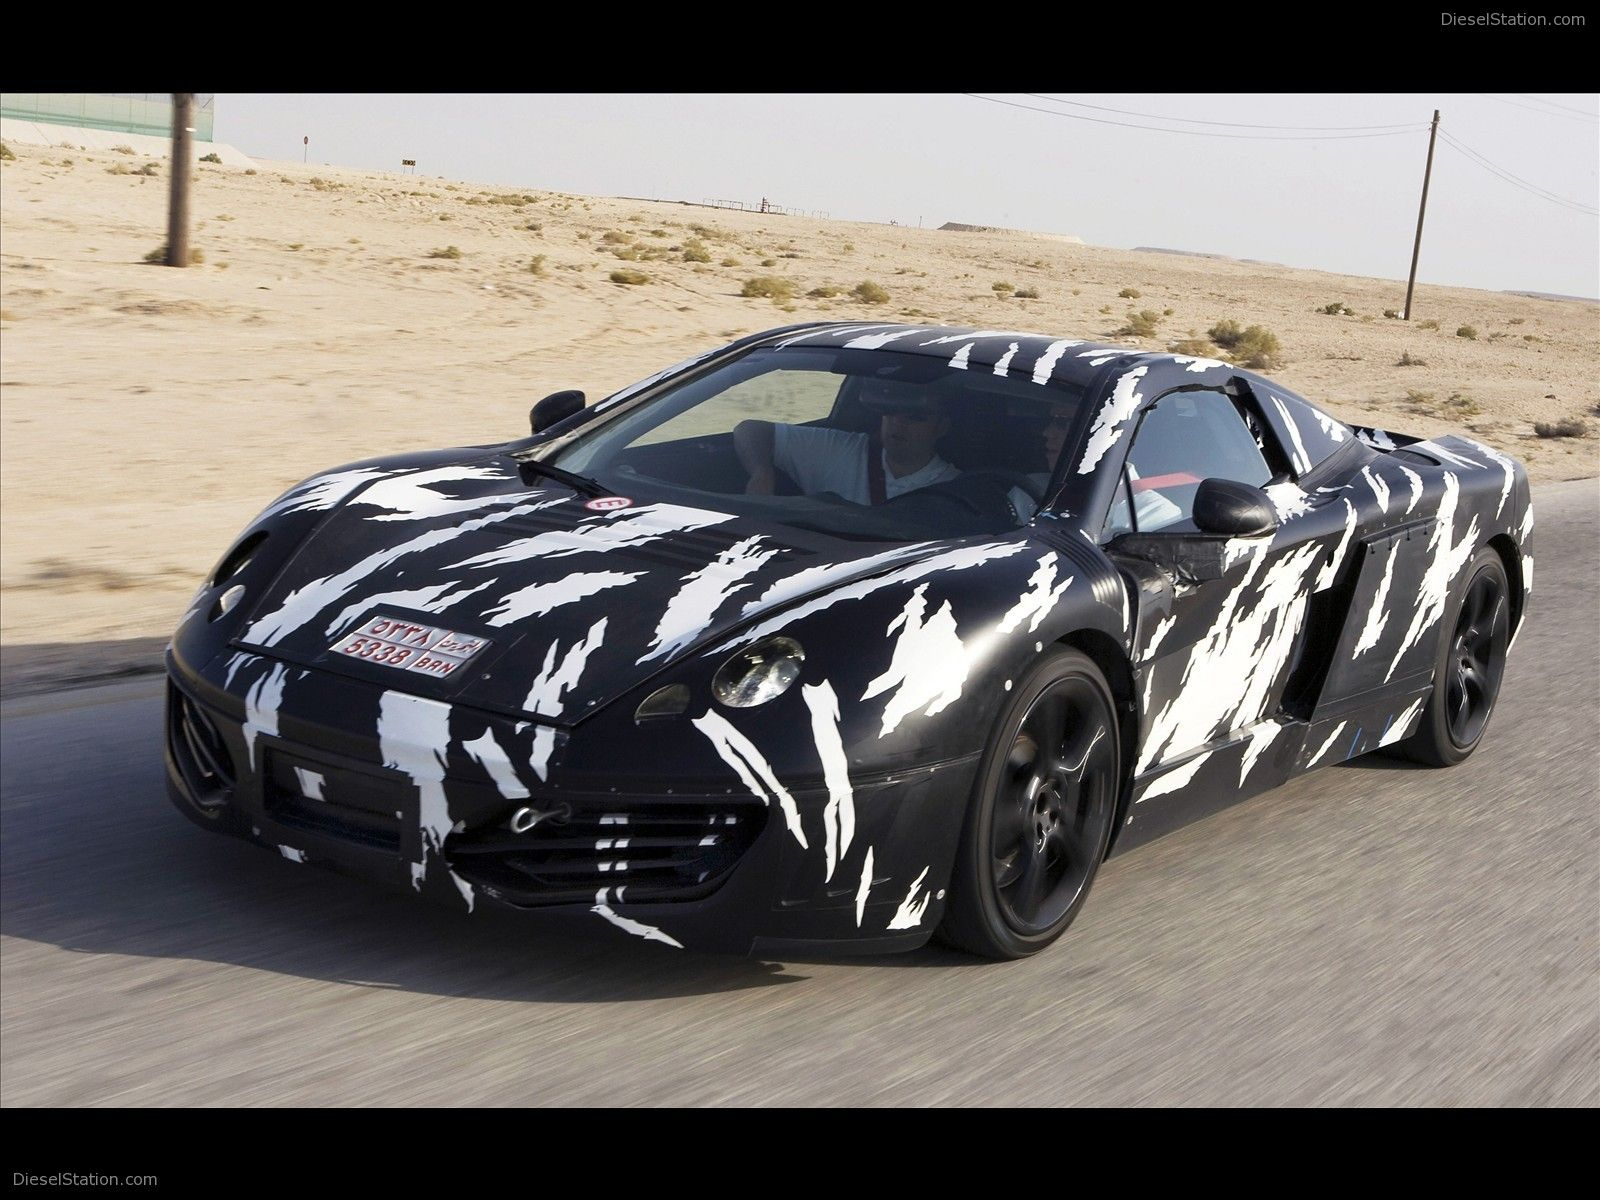 exotic cars wallpaper 1600x1200 37218